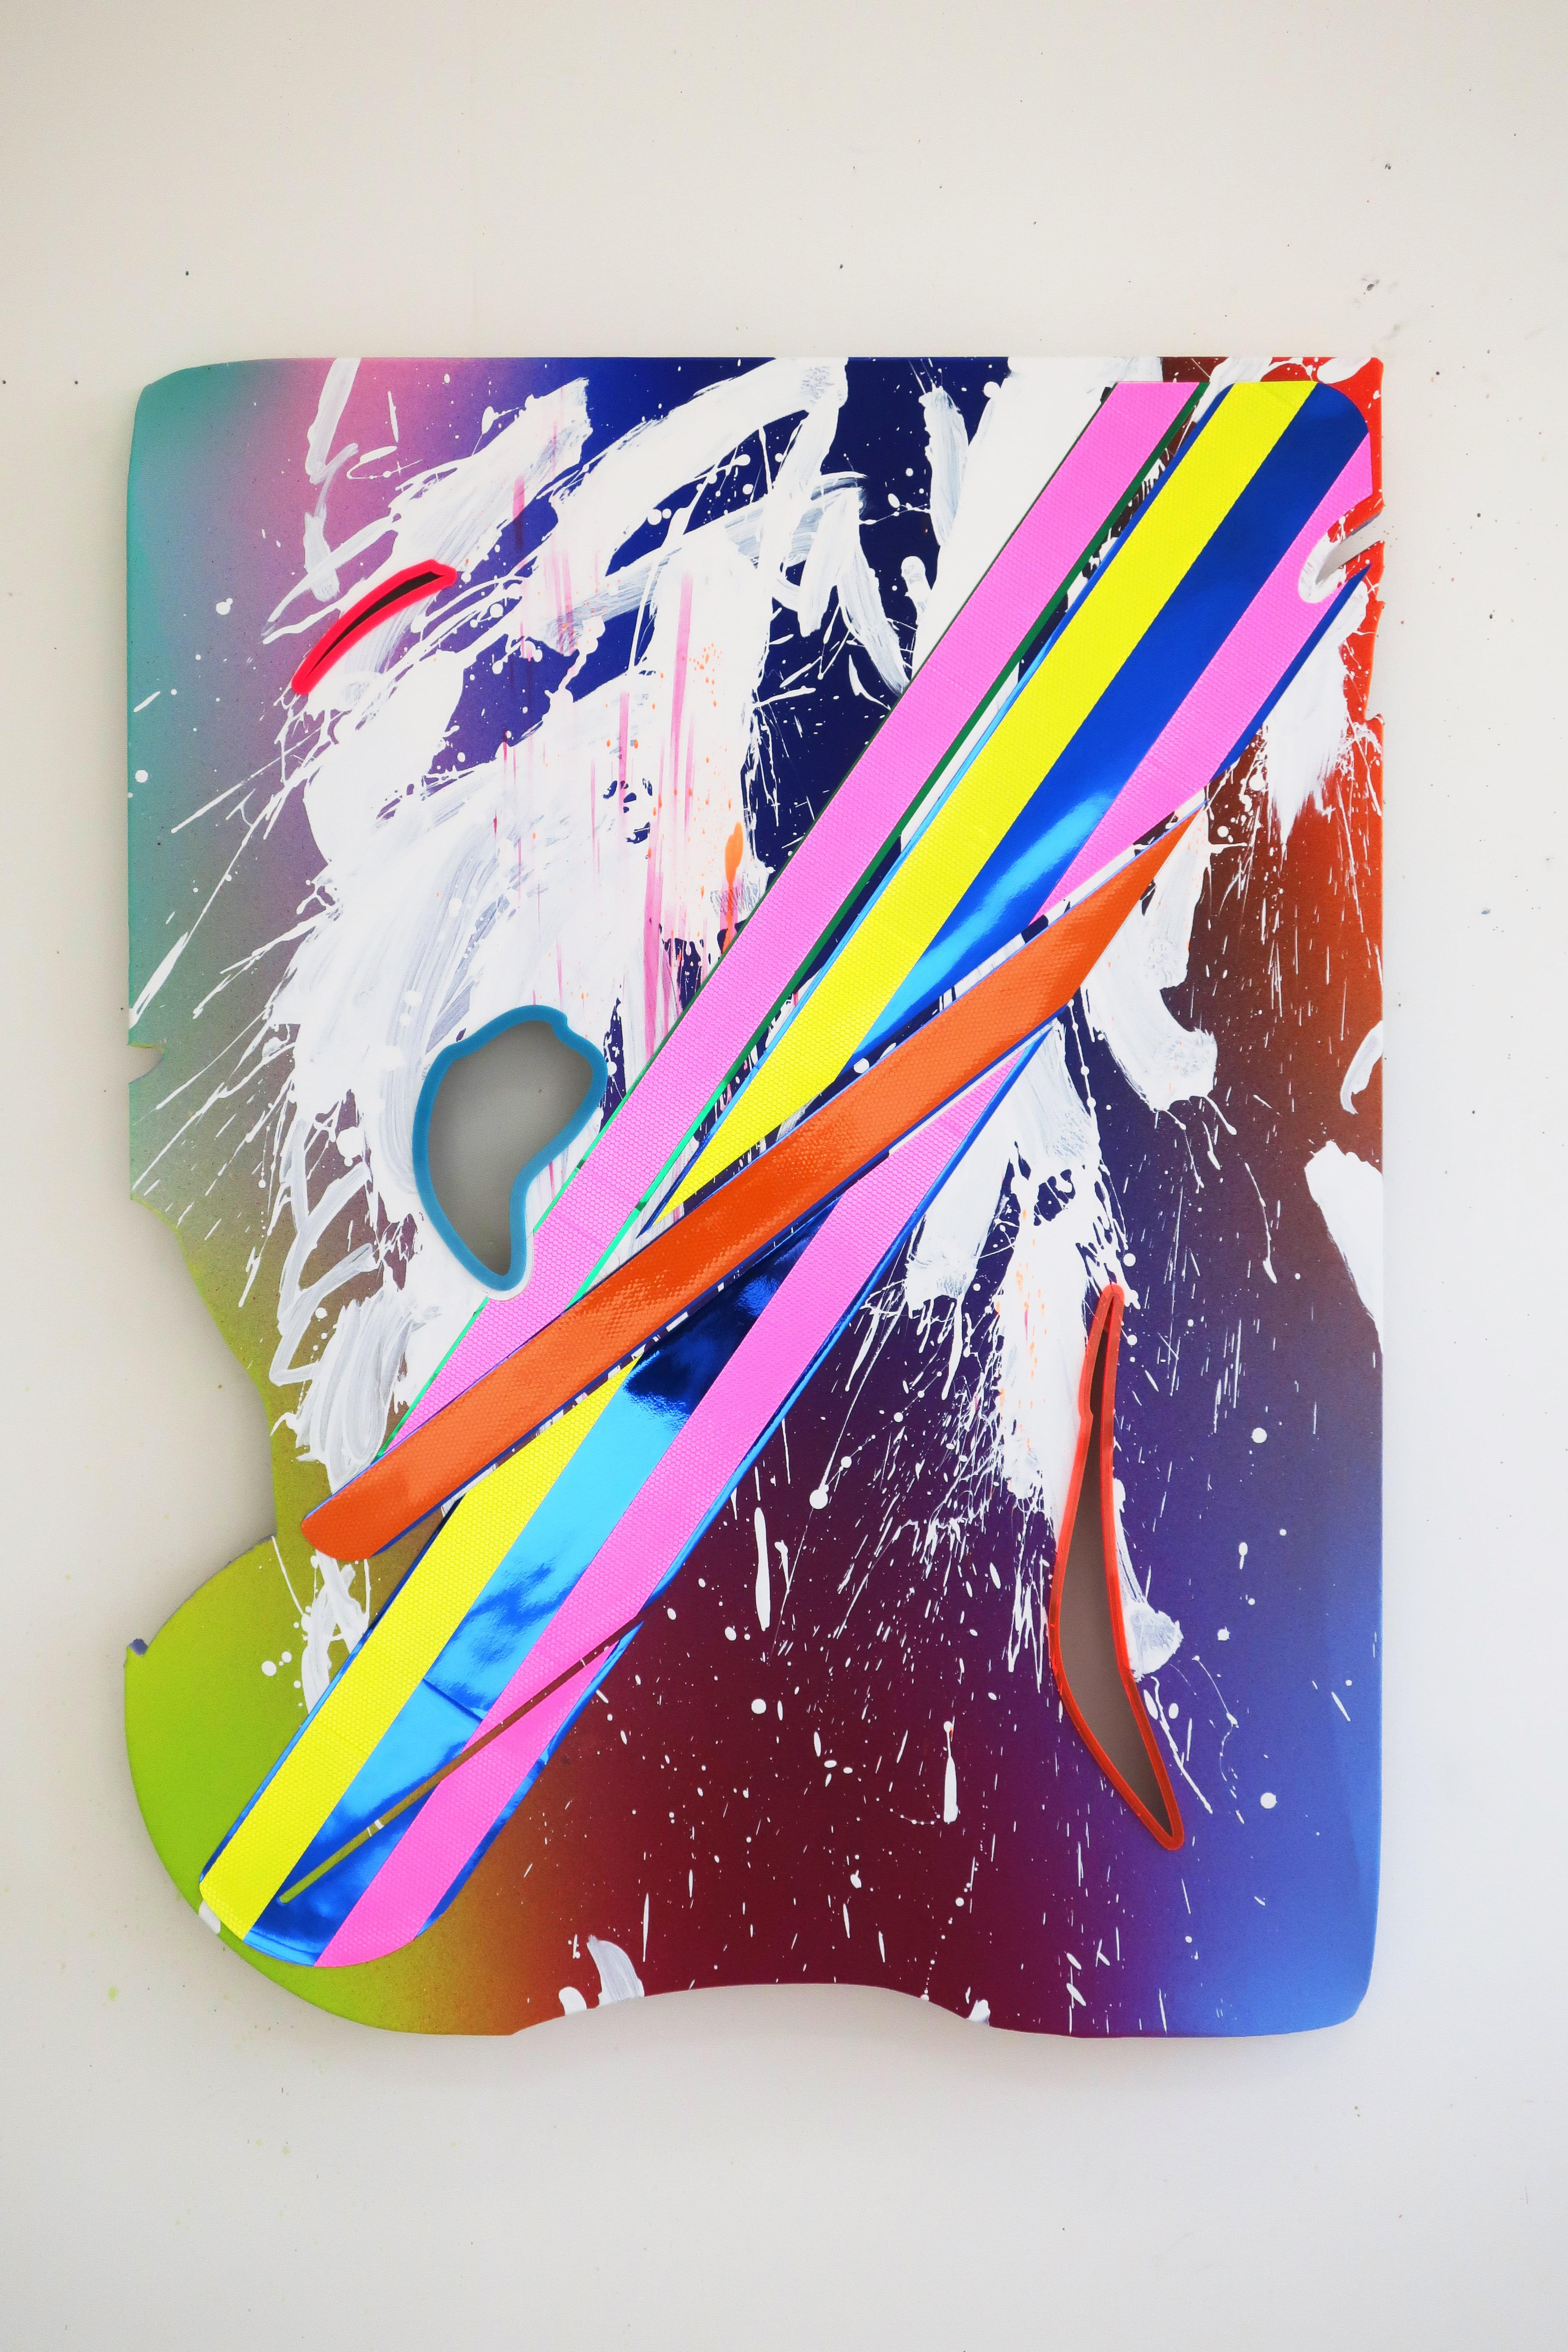 NemesM_Police-Paintings-07_2019_120x90cm_light-reflective-vinyl-mirror-paper-lasercut-perspex-acrylic-canvas-wood-min